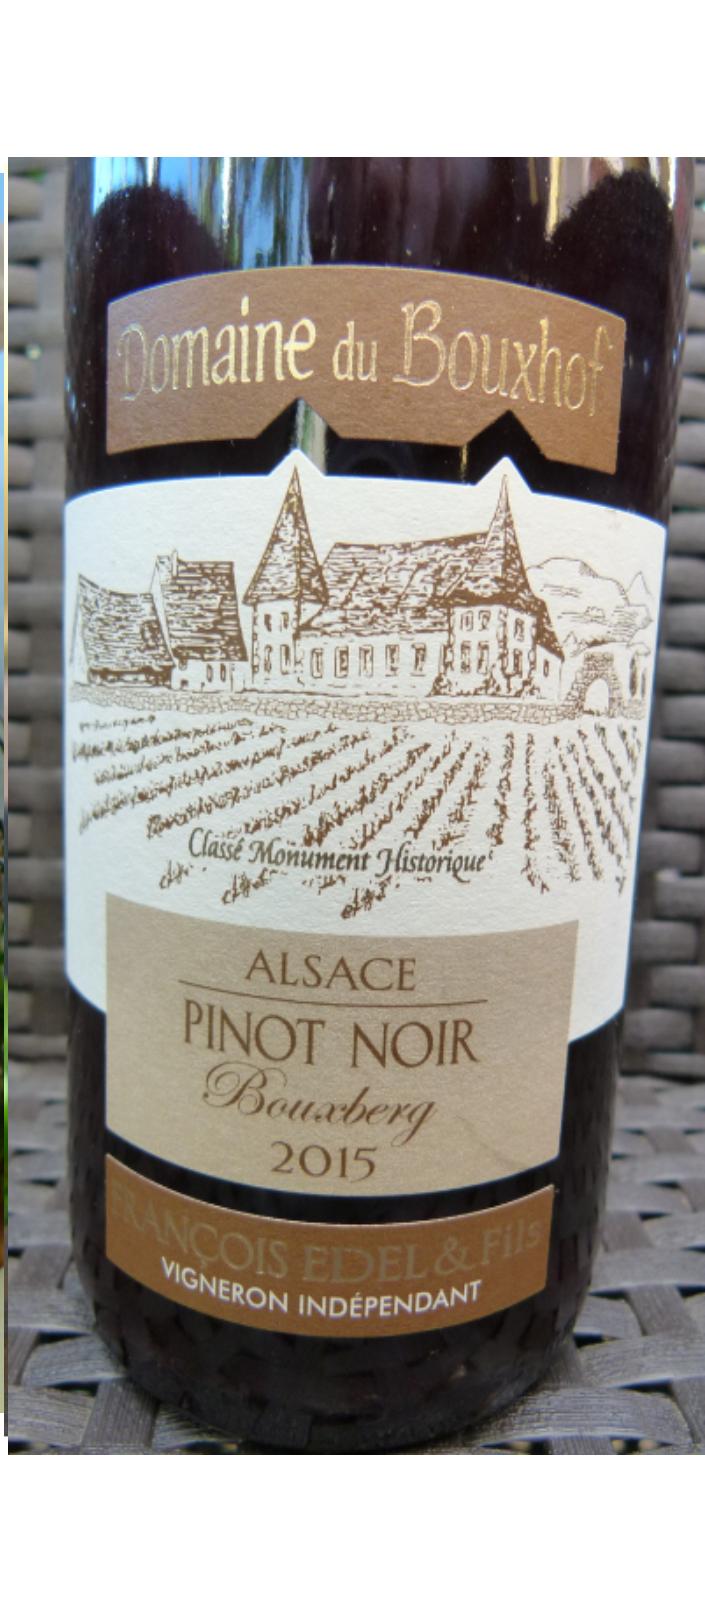 PINOT NOIR 2015 Bouxberg – Rouge d'Alsace